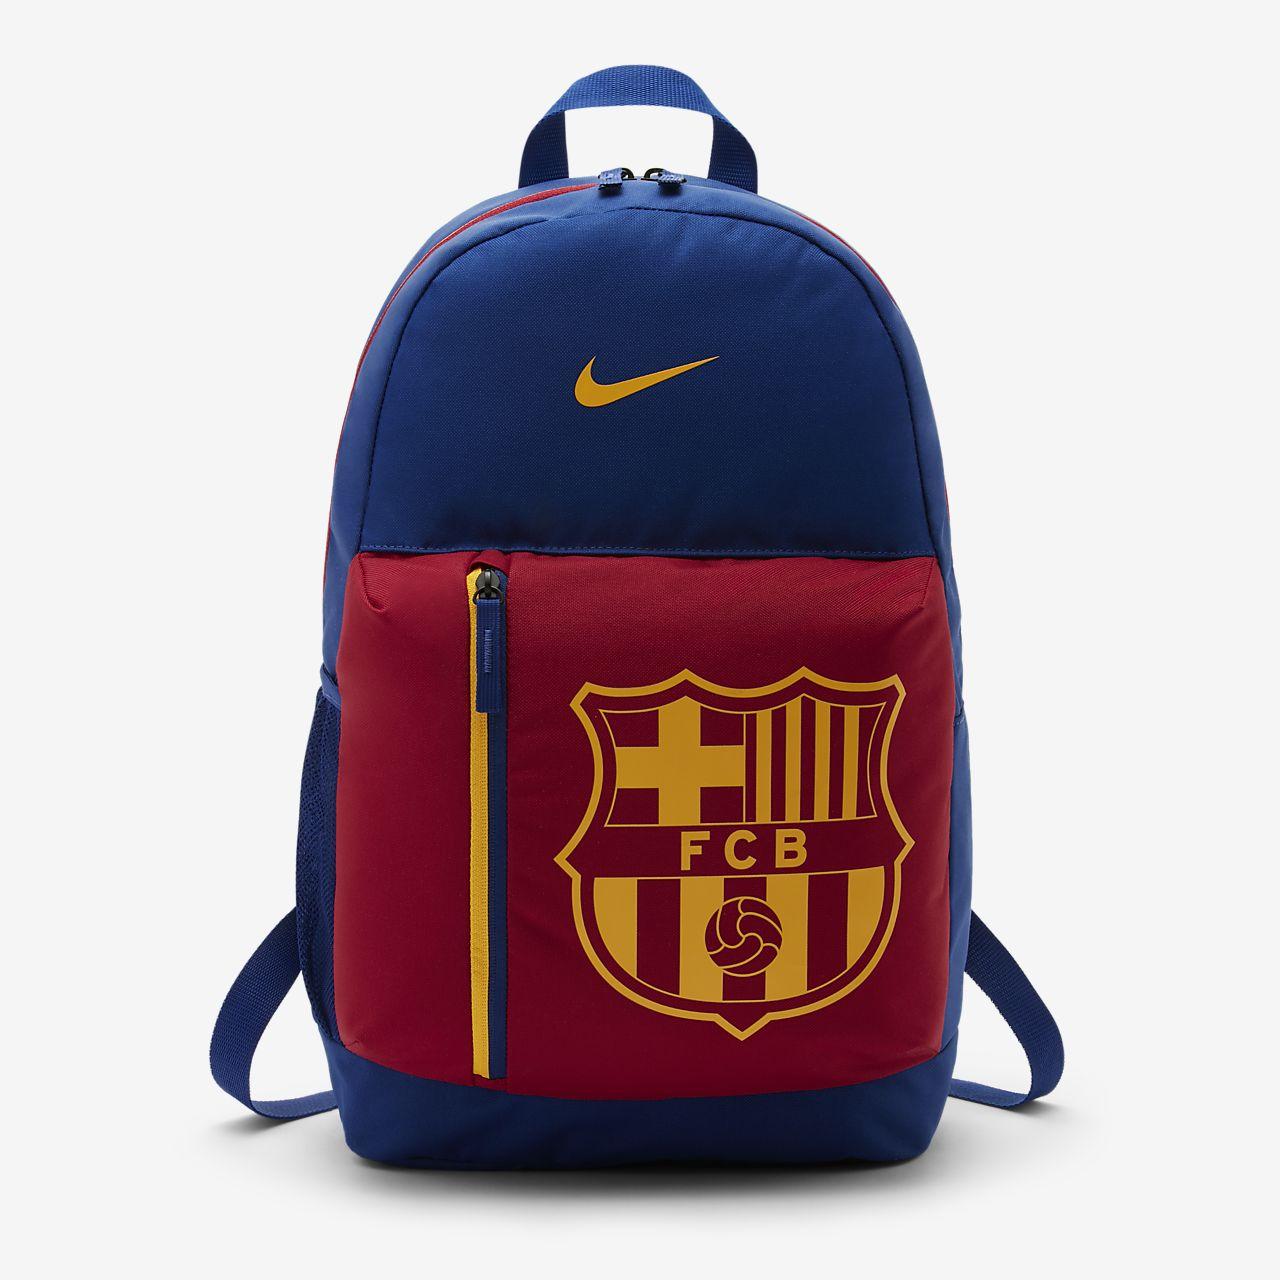 1bbcd1dd2 Mochila de fútbol para niños FC Barcelona Stadium. Nike.com CL